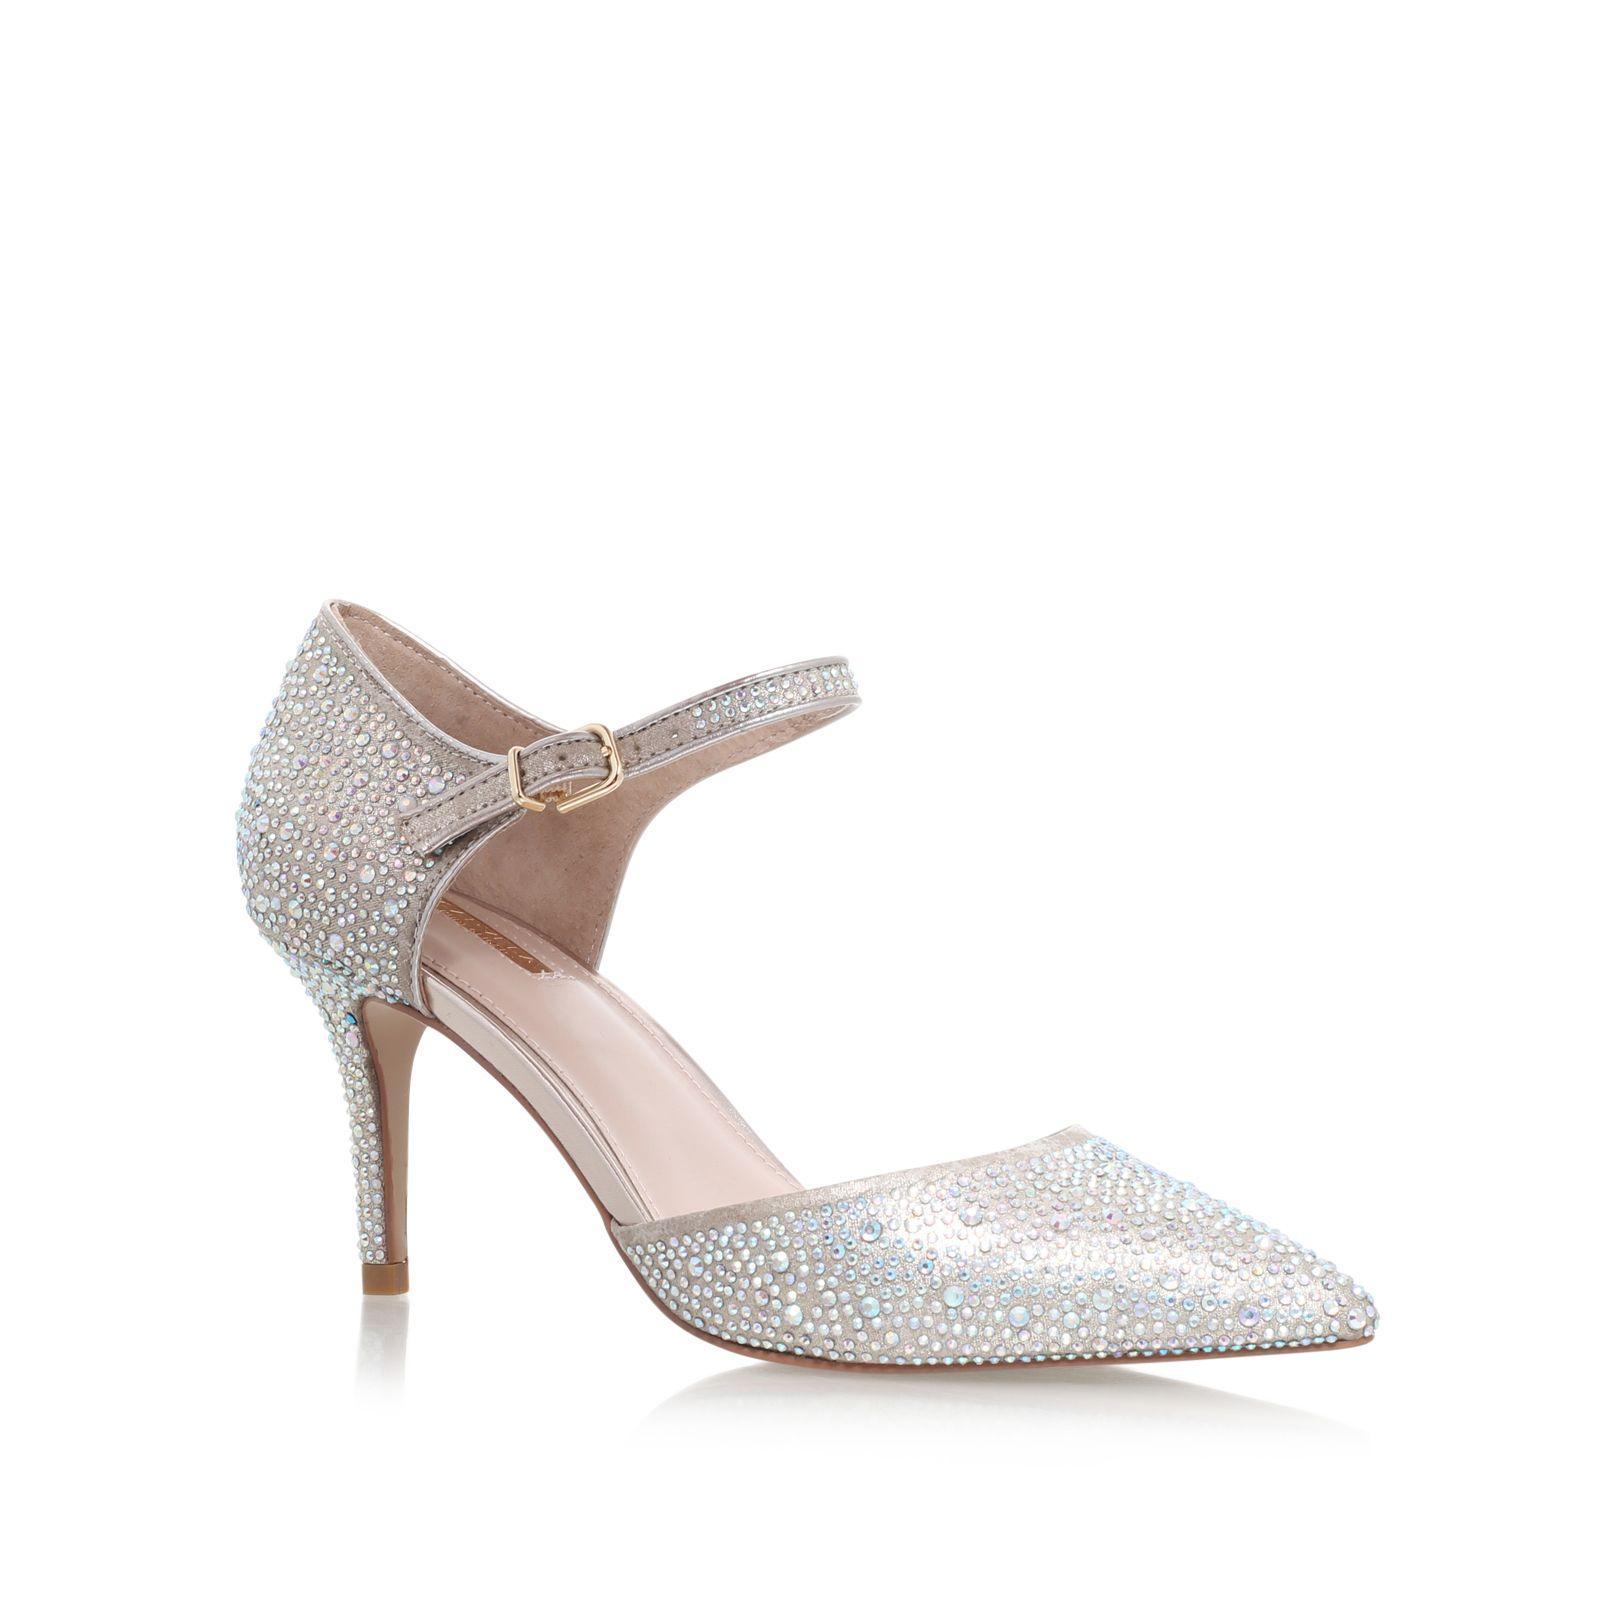 Carvela Kurt Geiger Wedding Shoes